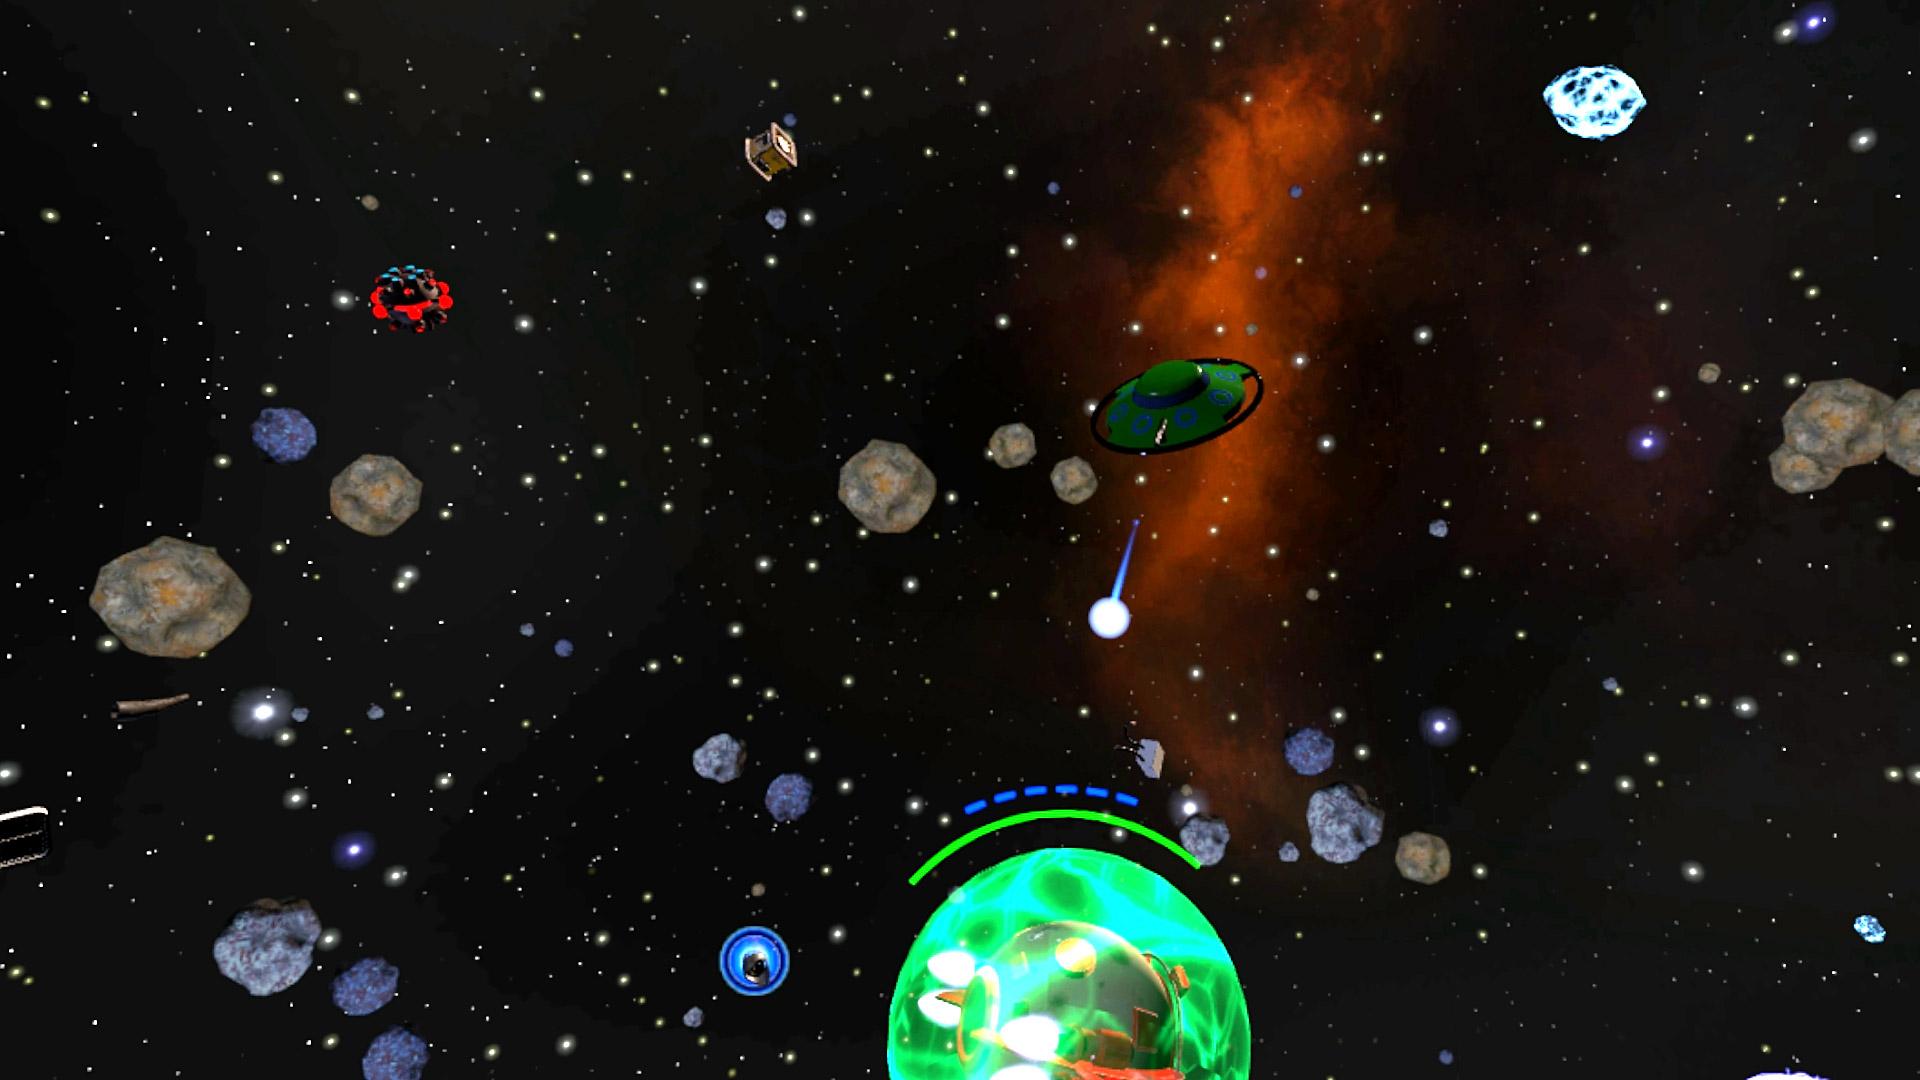 Oculus Quest 游戏《Space Junk》宇宙垃圾插图(2)